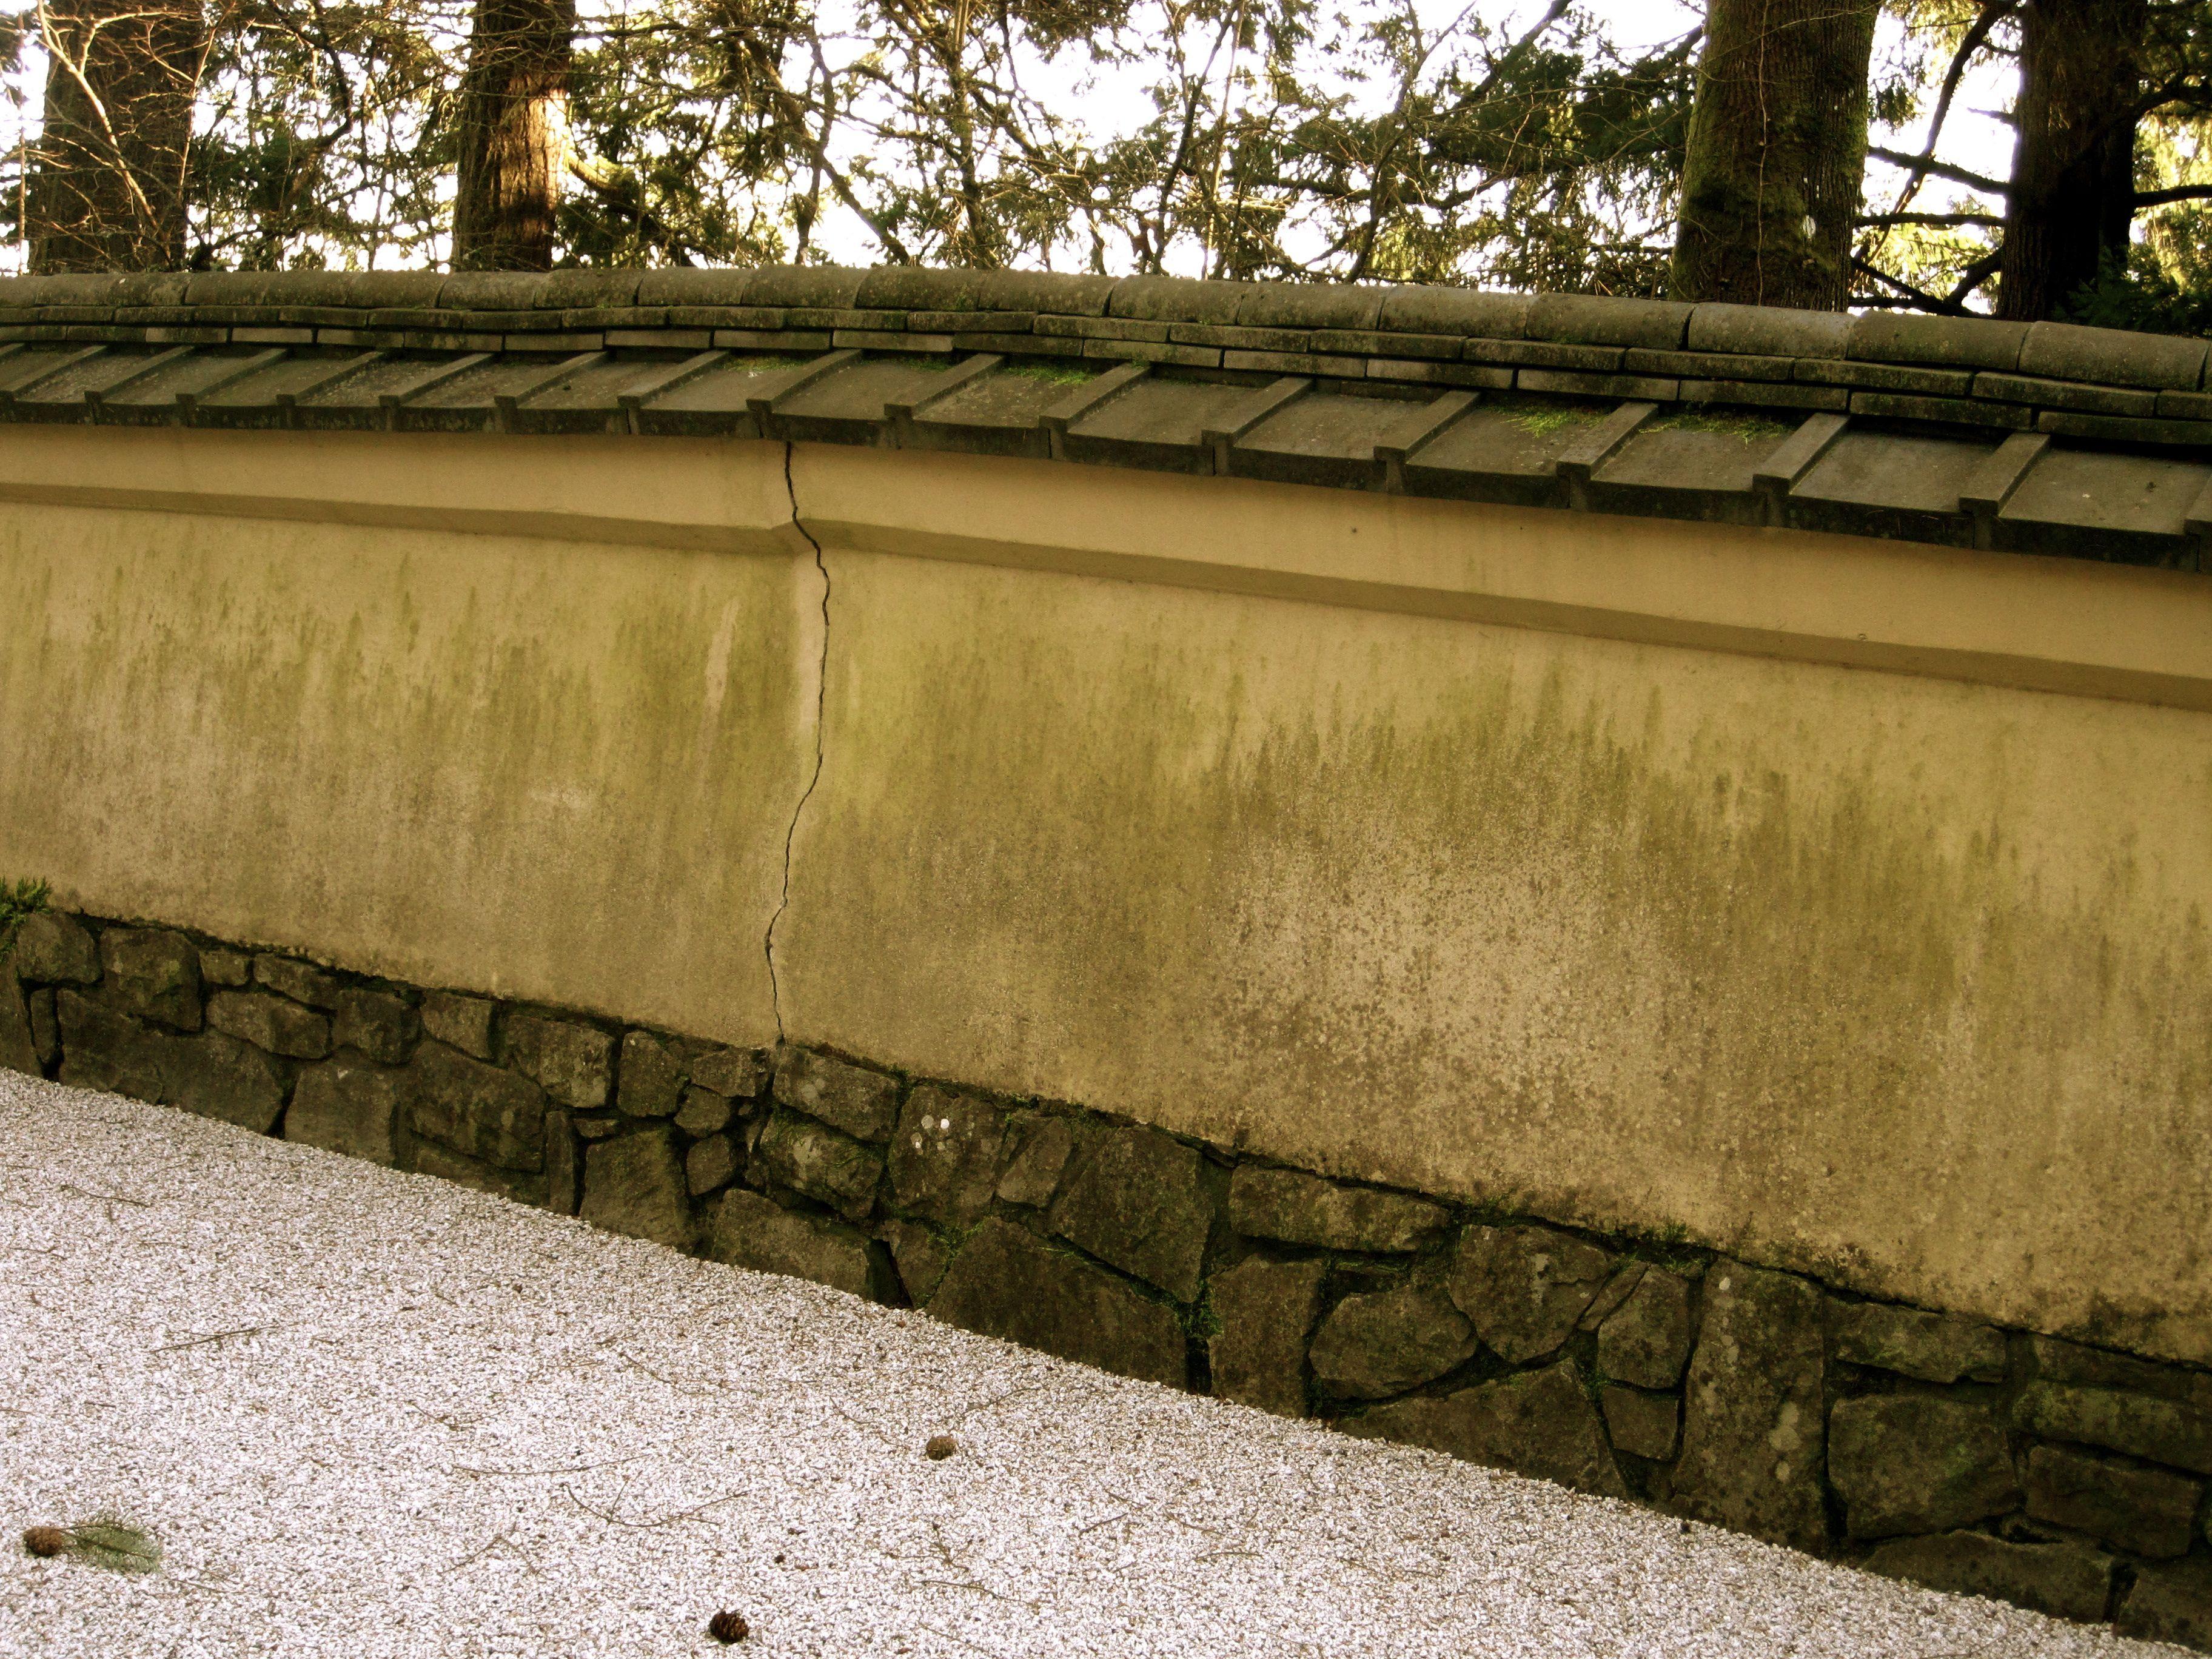 japanese wall - Google Search | Japanese Design | Pinterest ...